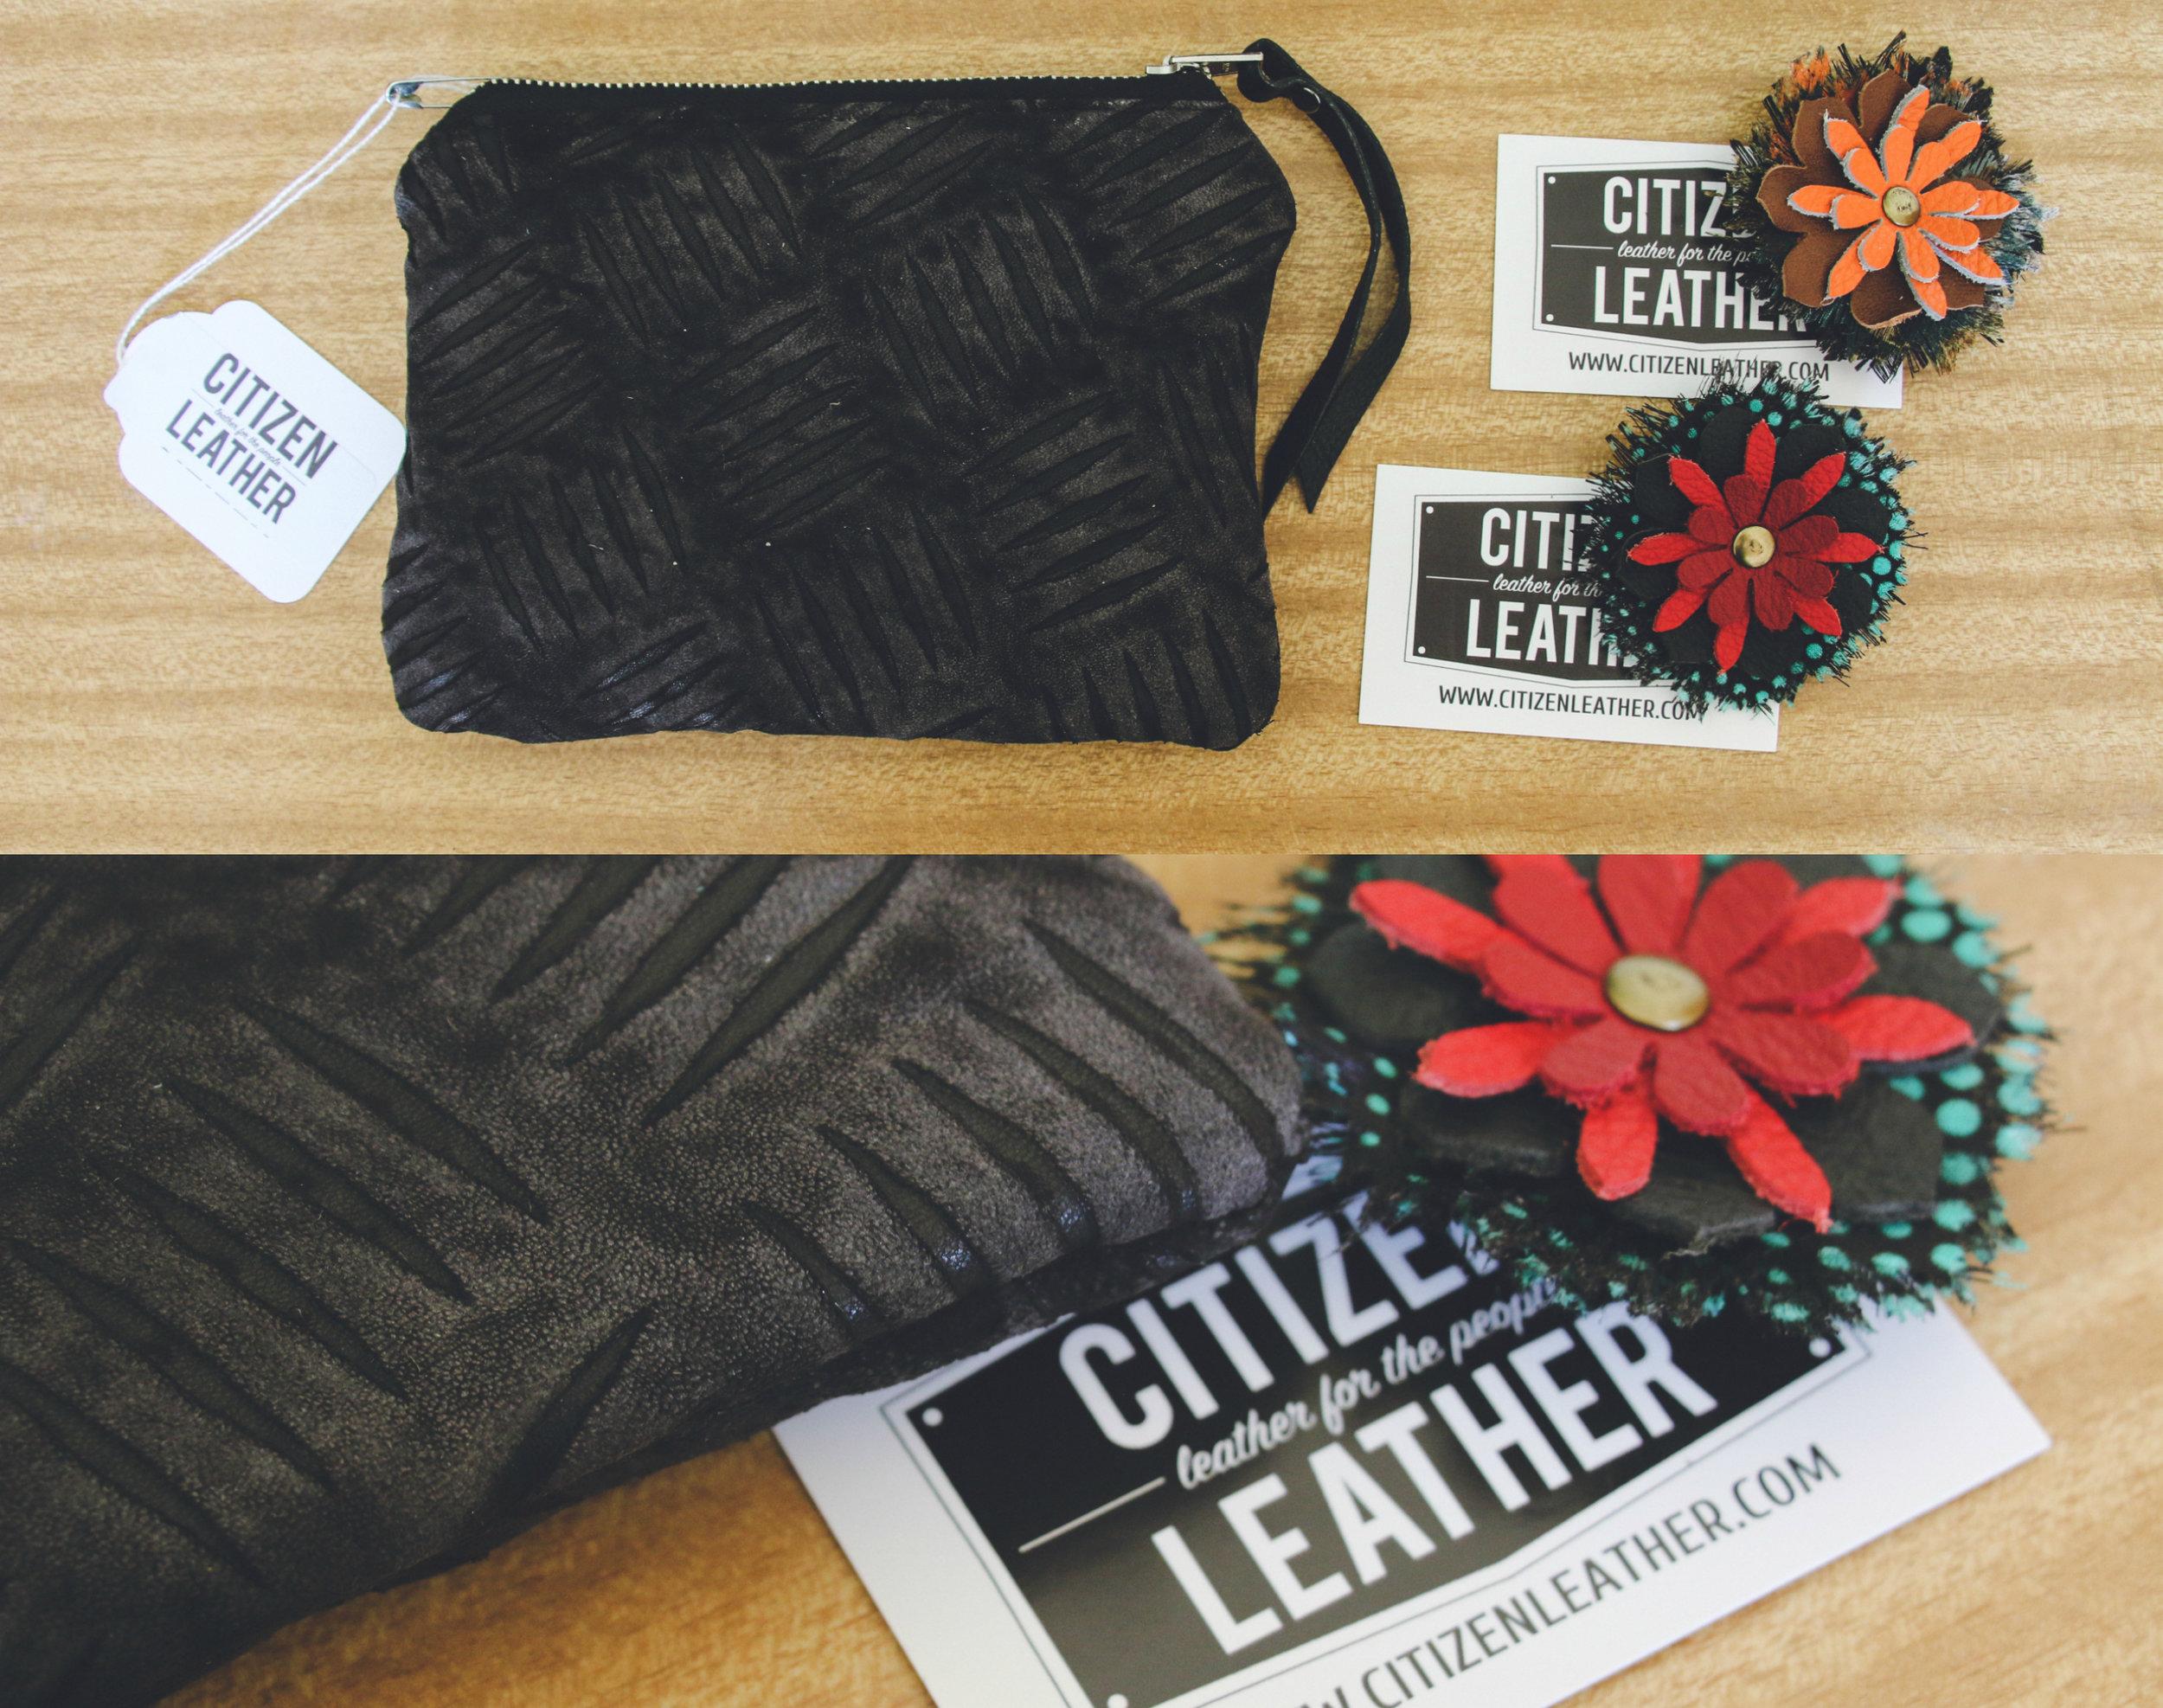 citizen leather.jpg